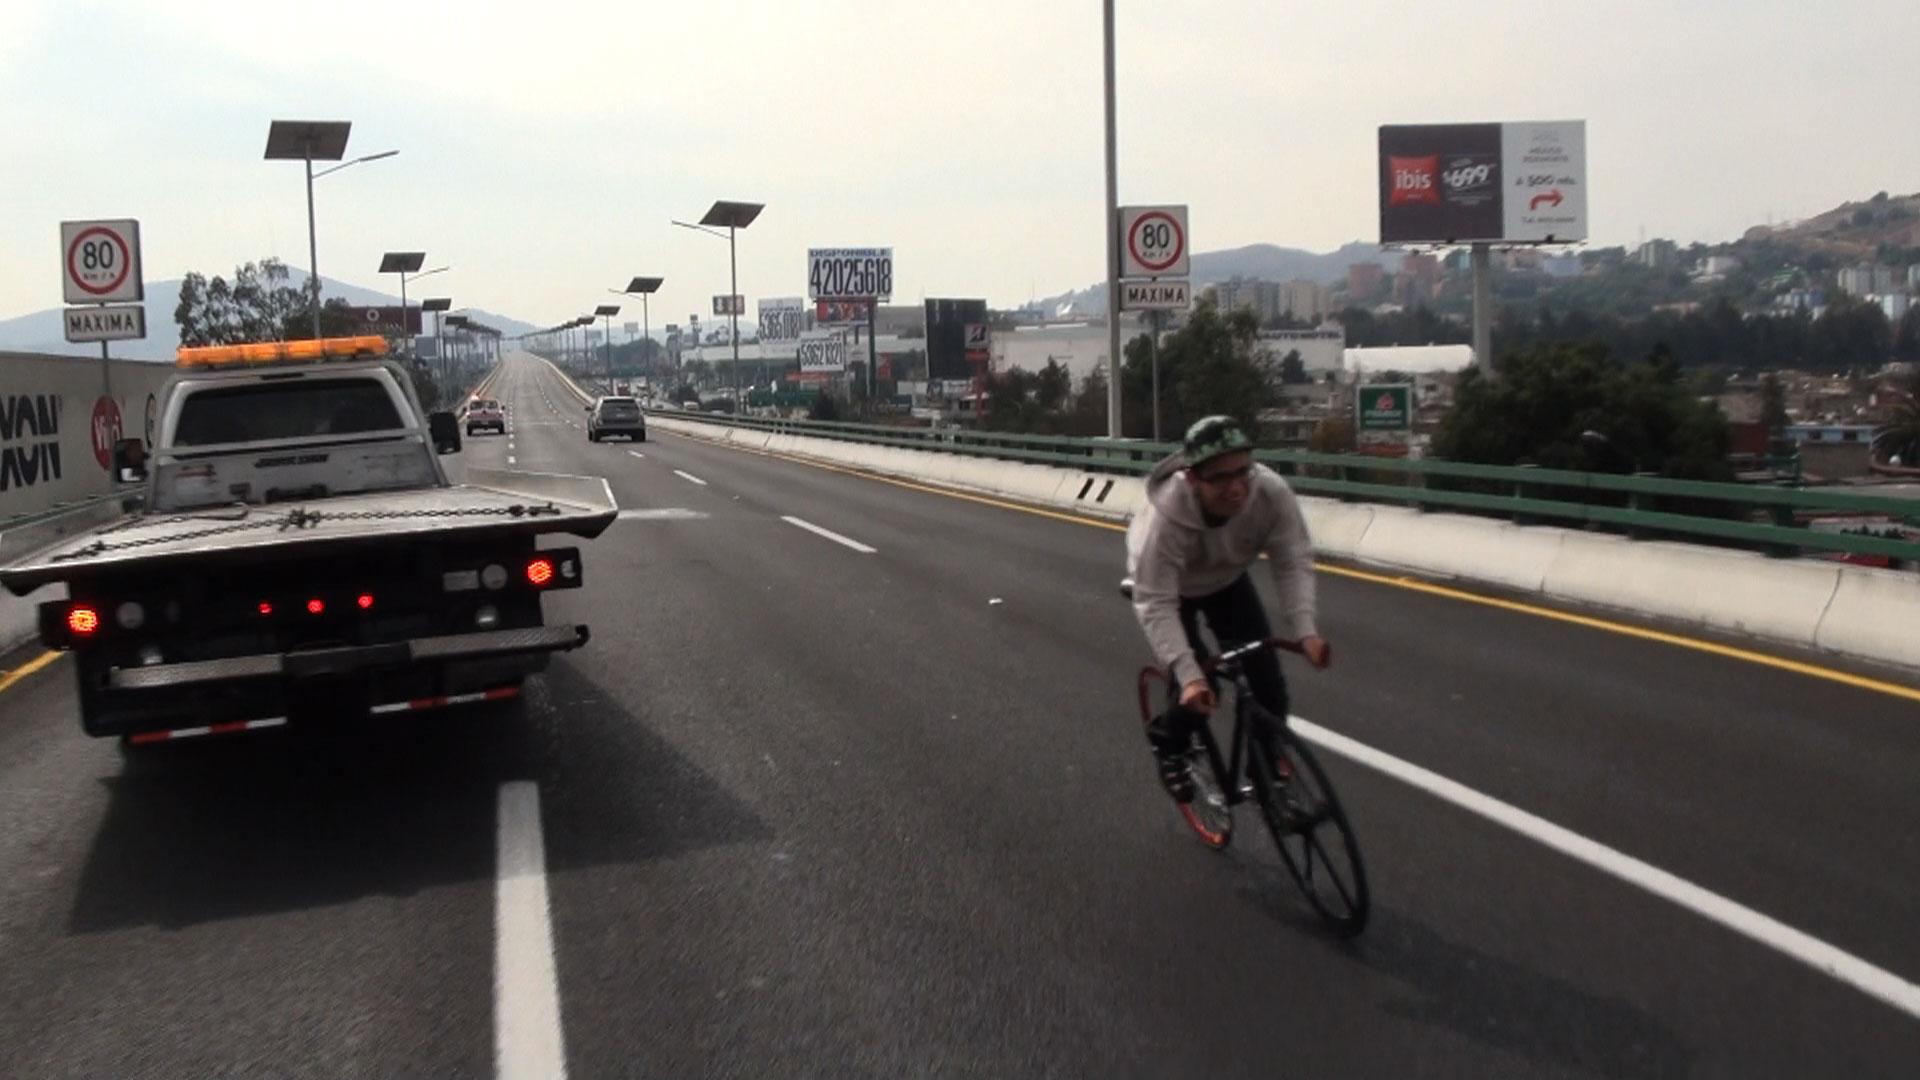 RoadSage1